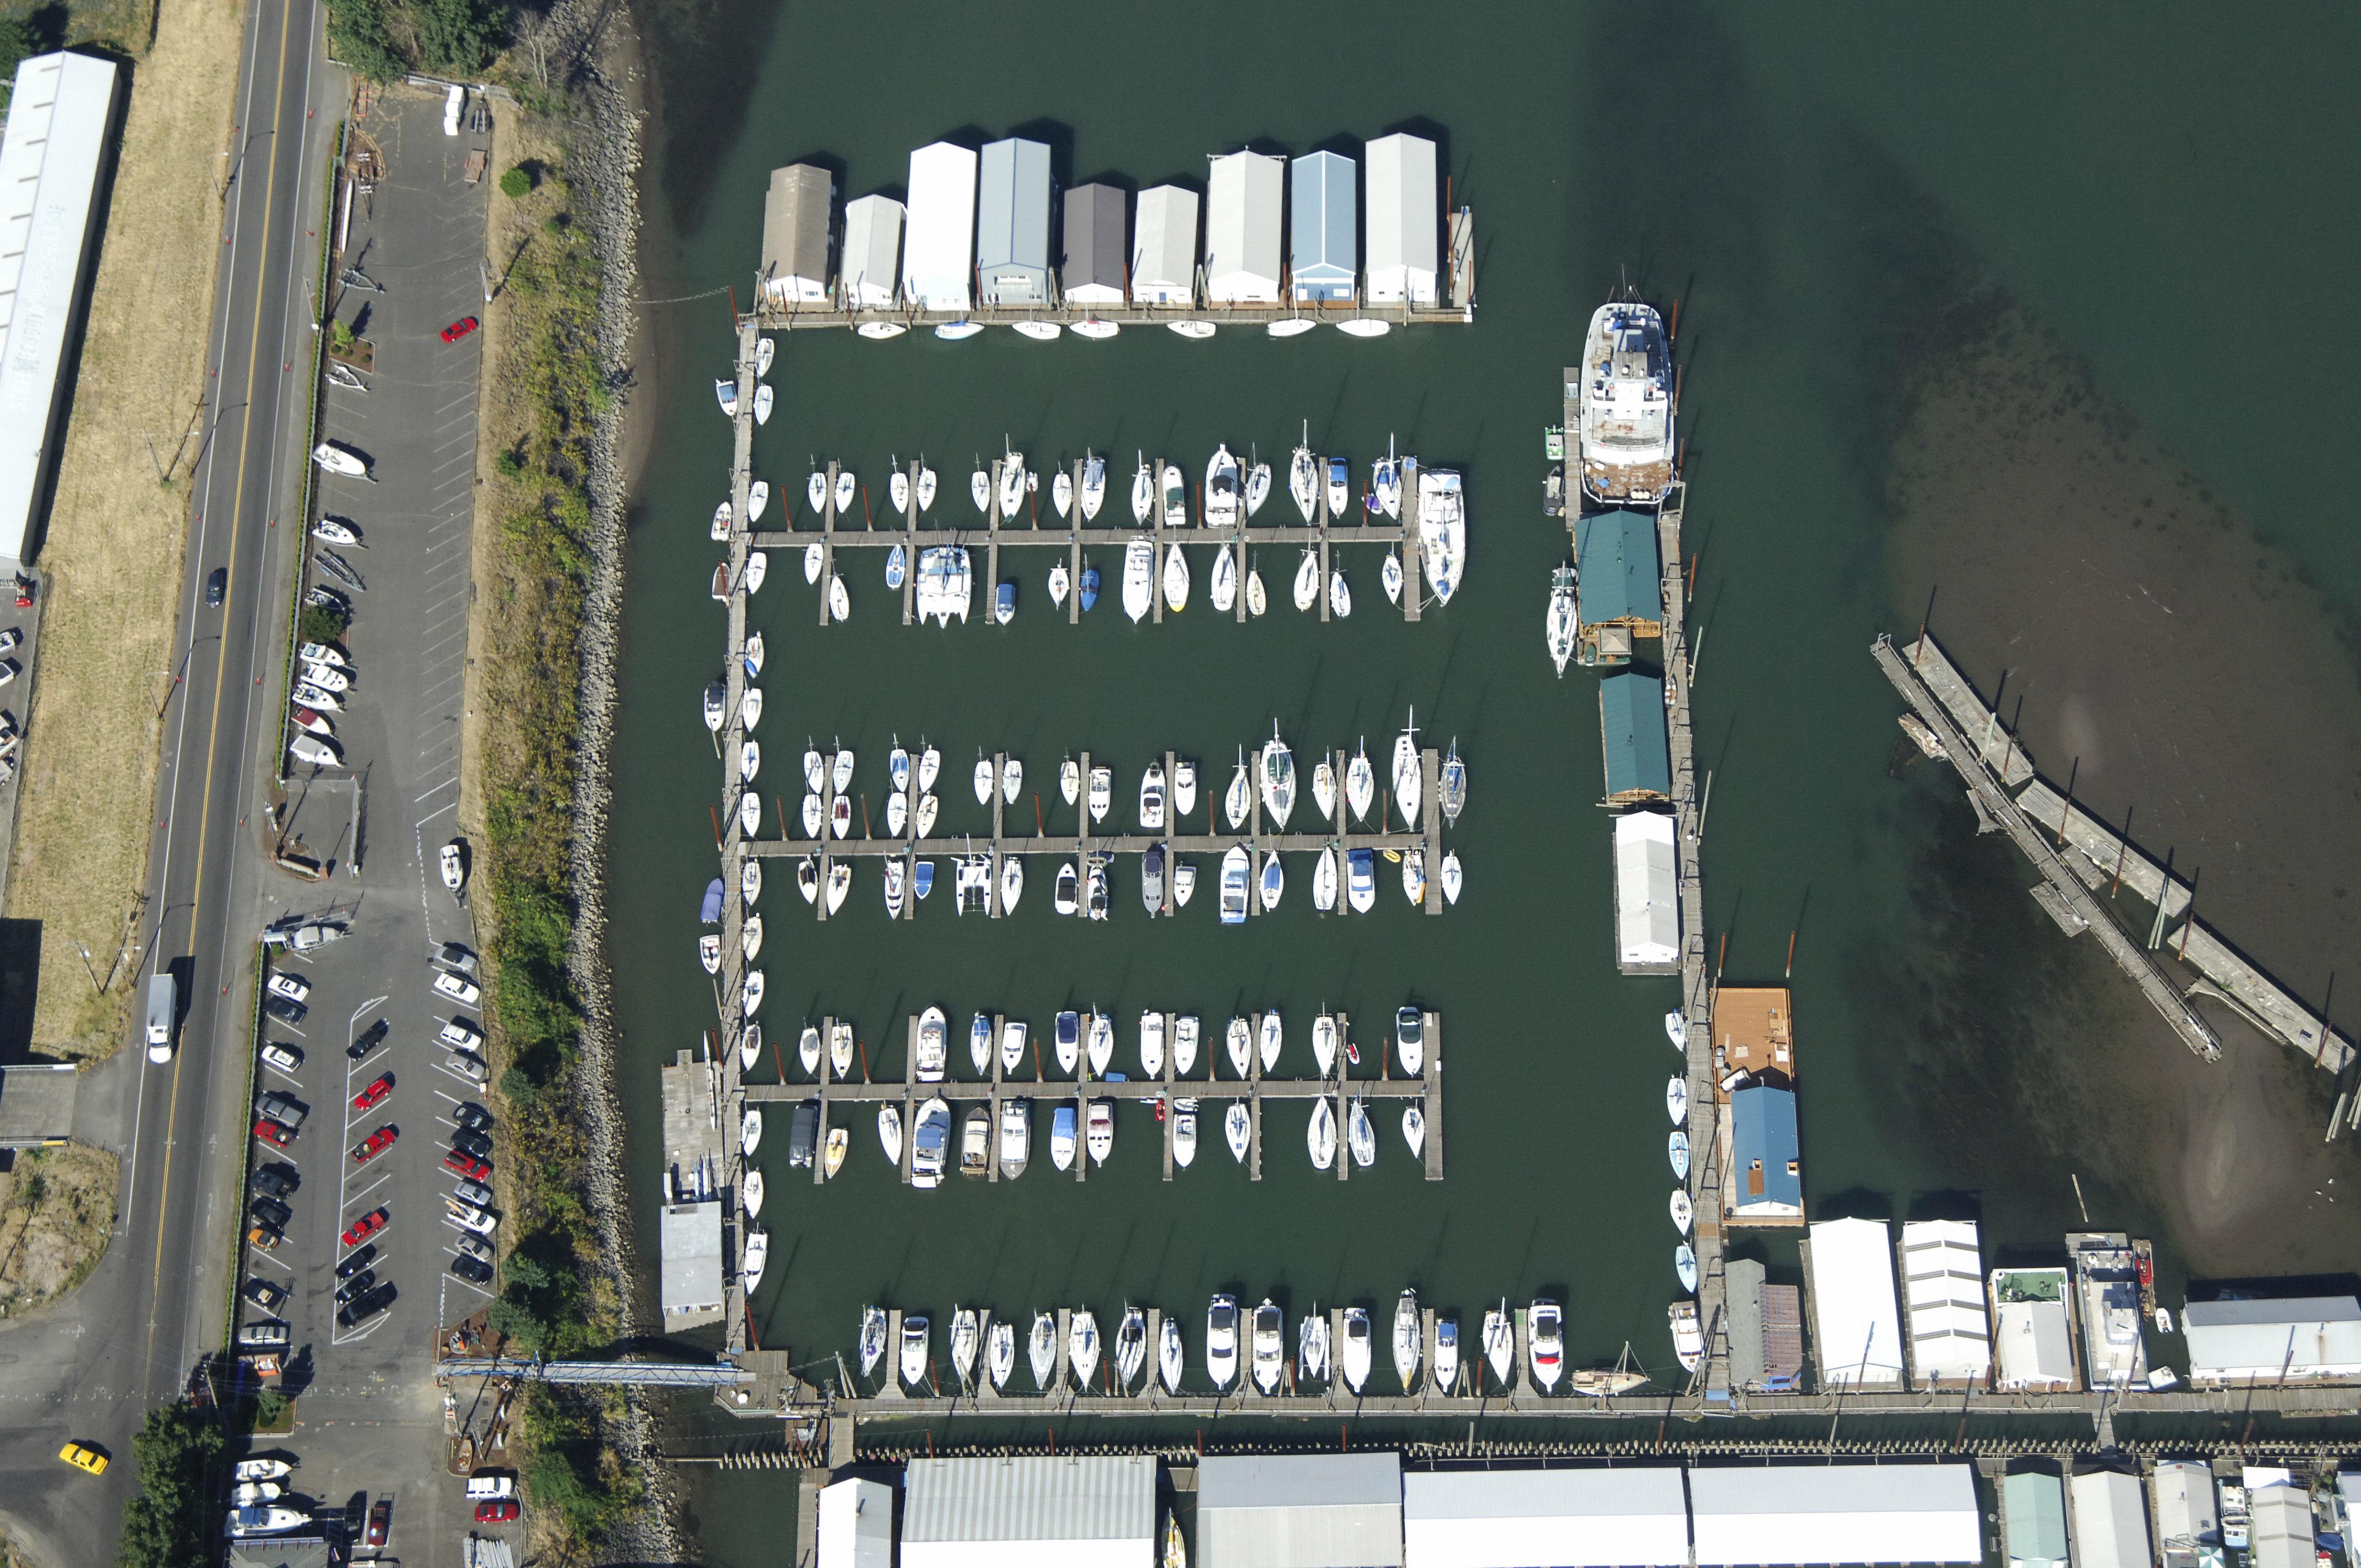 McCuddy's Marina in Portland, OR, United States - Marina